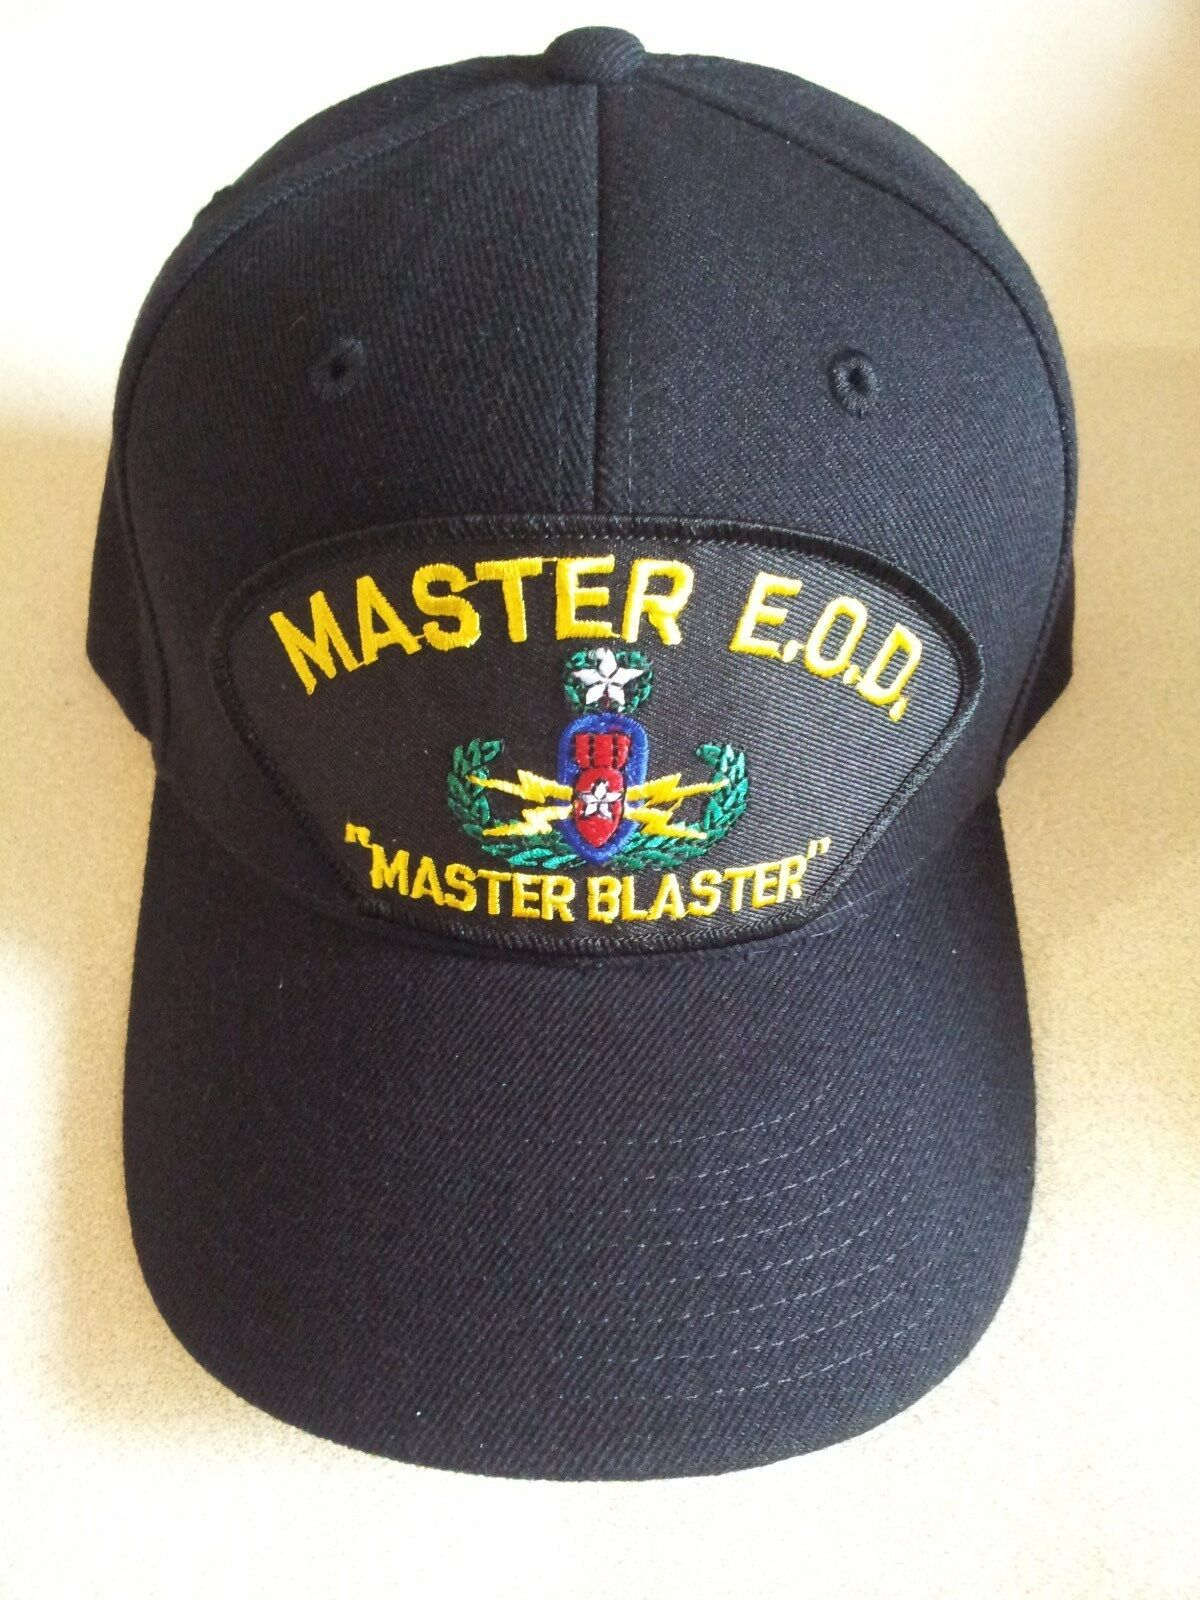 U.S. ARMY DISPOSAL MASTER E.O.D. EXPLOSIVE ORDNANCE DISPOSAL ARMY Military Ball Cap 5b80af